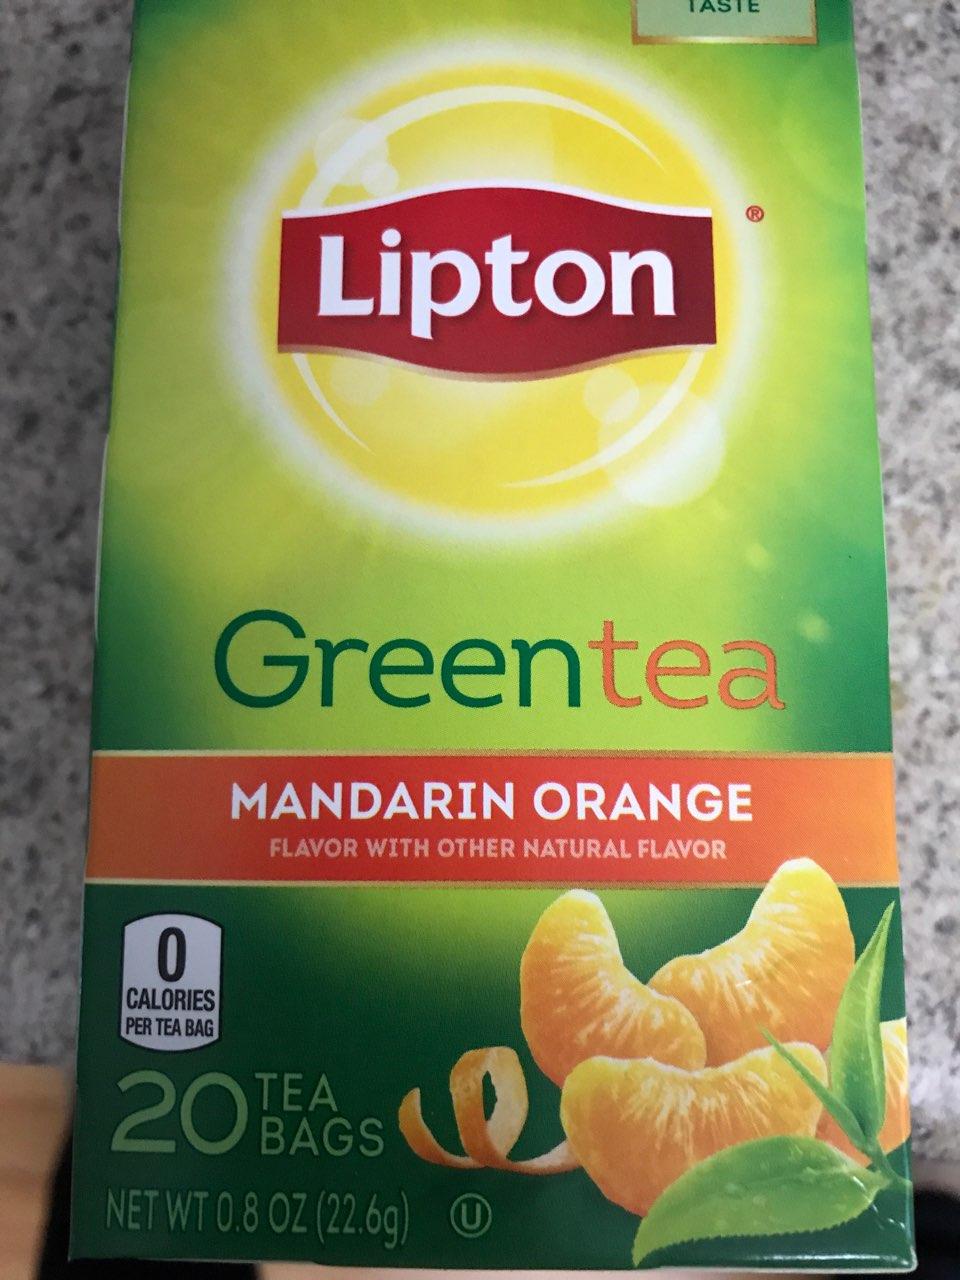 Lipton Green Tea, Mandarin, Orange, 20